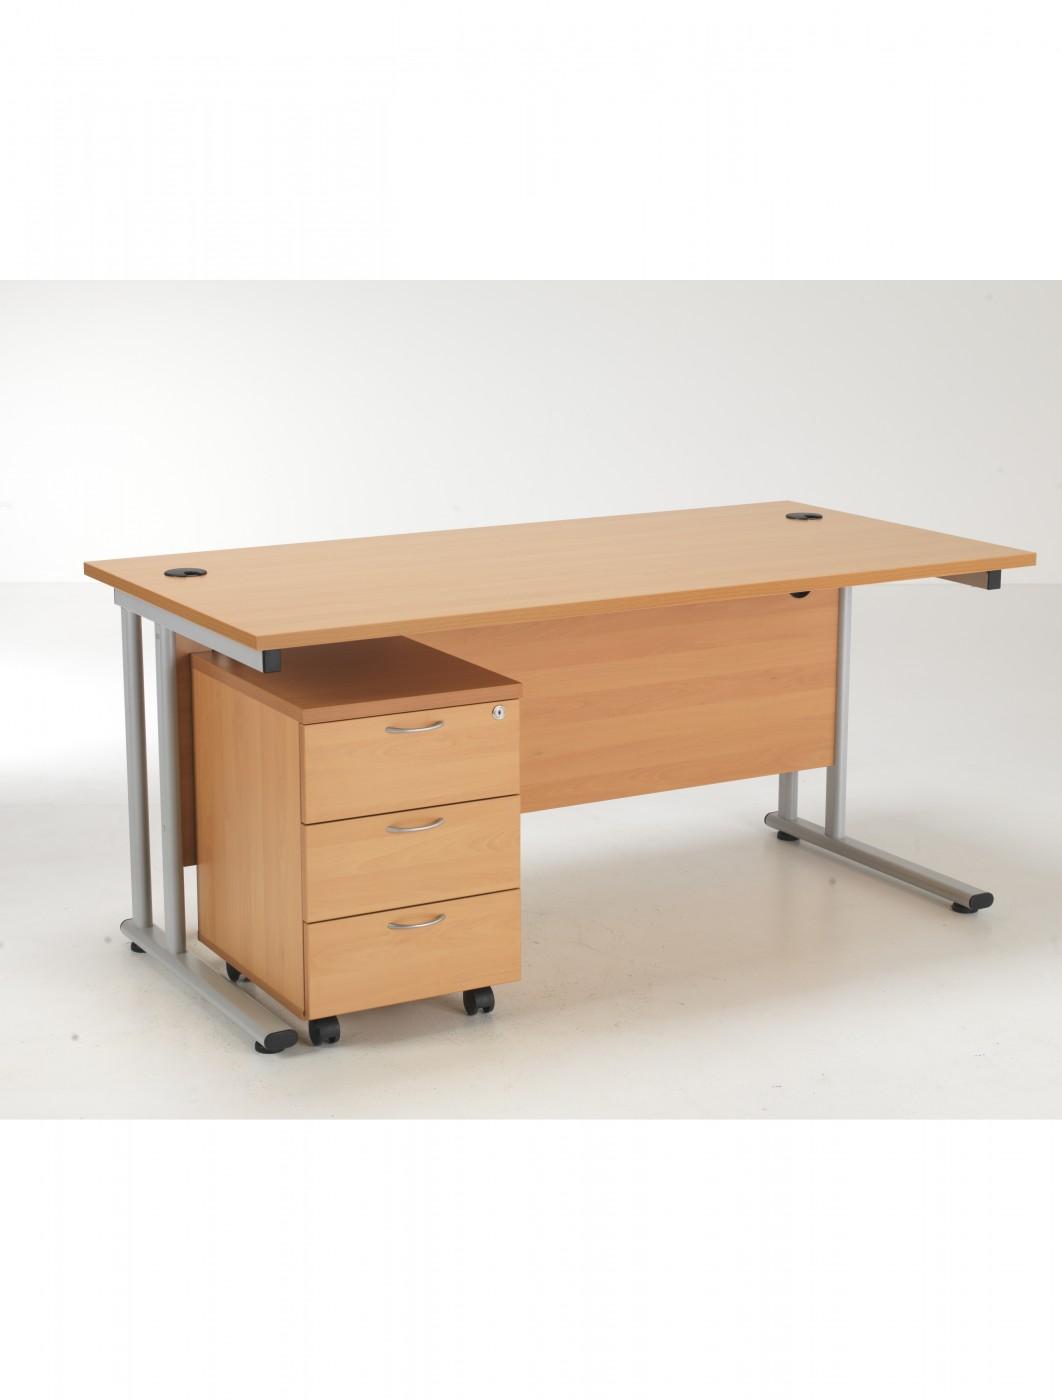 Tc Desk And Pedestal Lite1680bund3be 121 Office Furniture